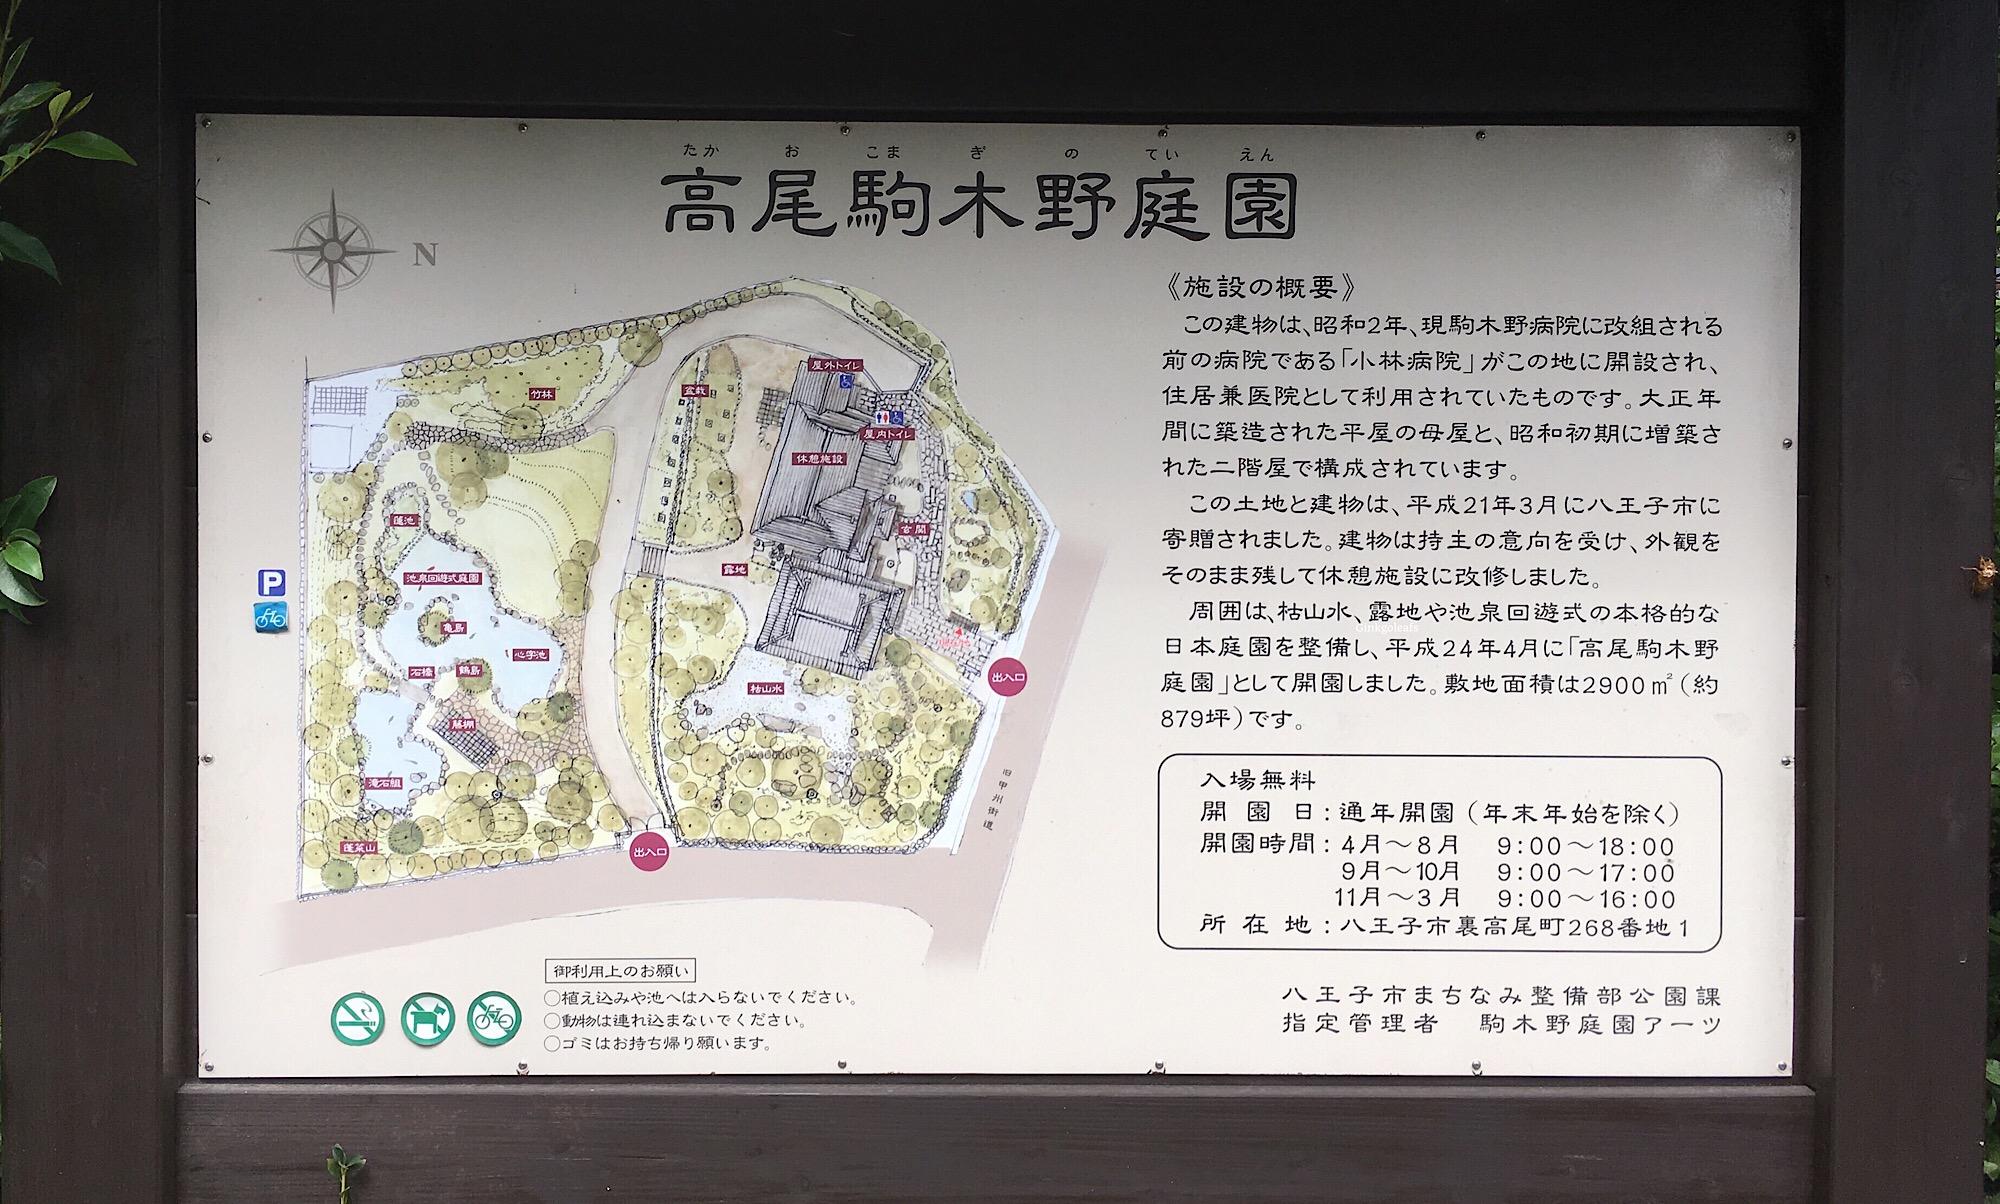 Karte des Gartens